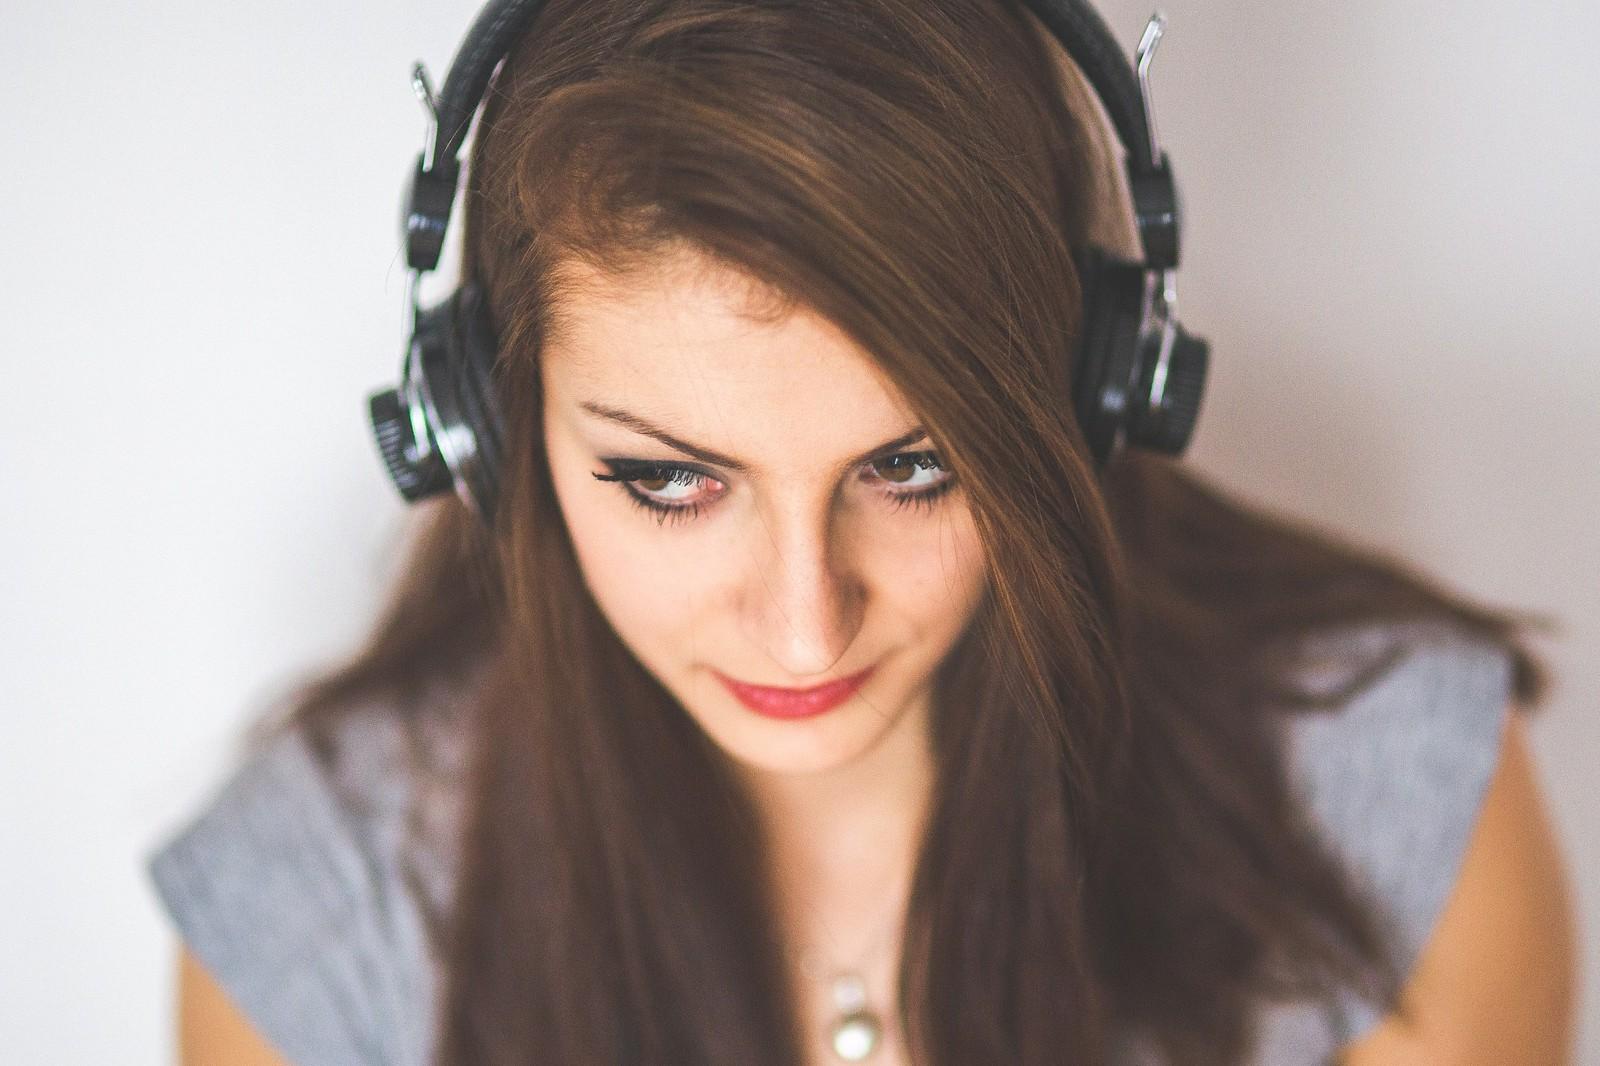 kopfhörer ohne nebengeräusche